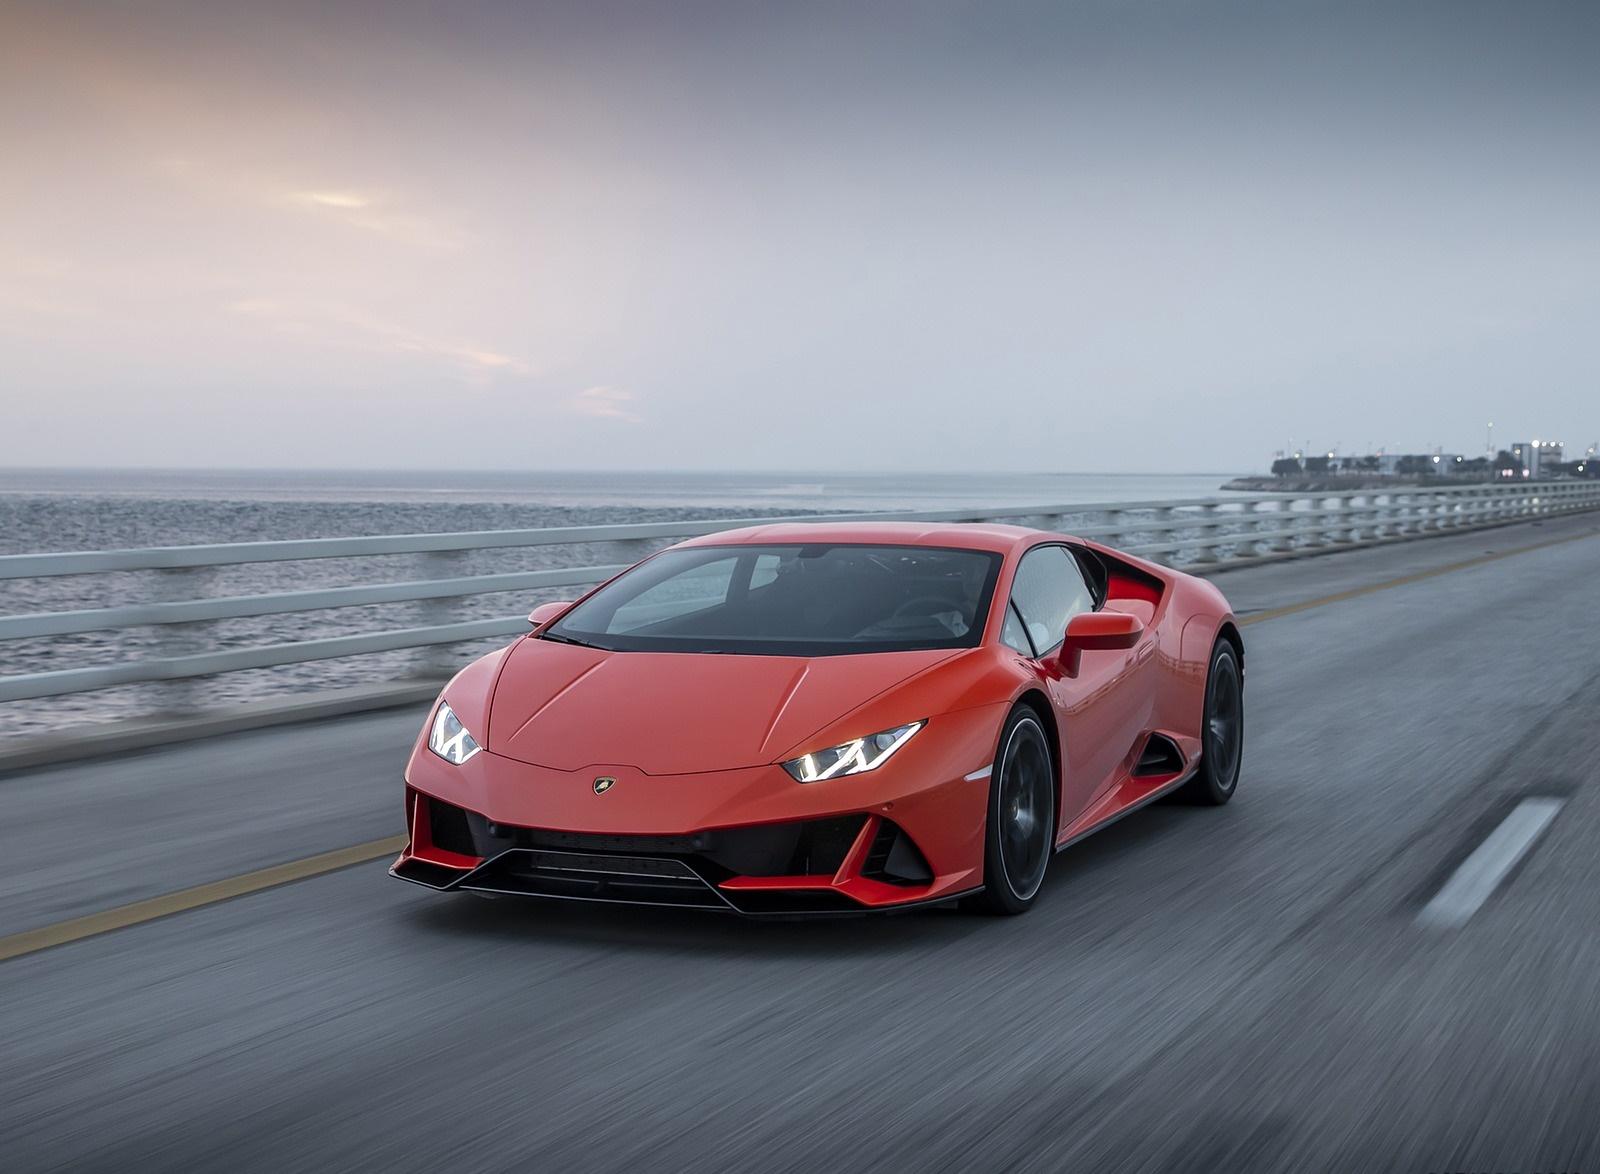 2019 Lamborghini Huracán EVO Front Wallpapers (11)